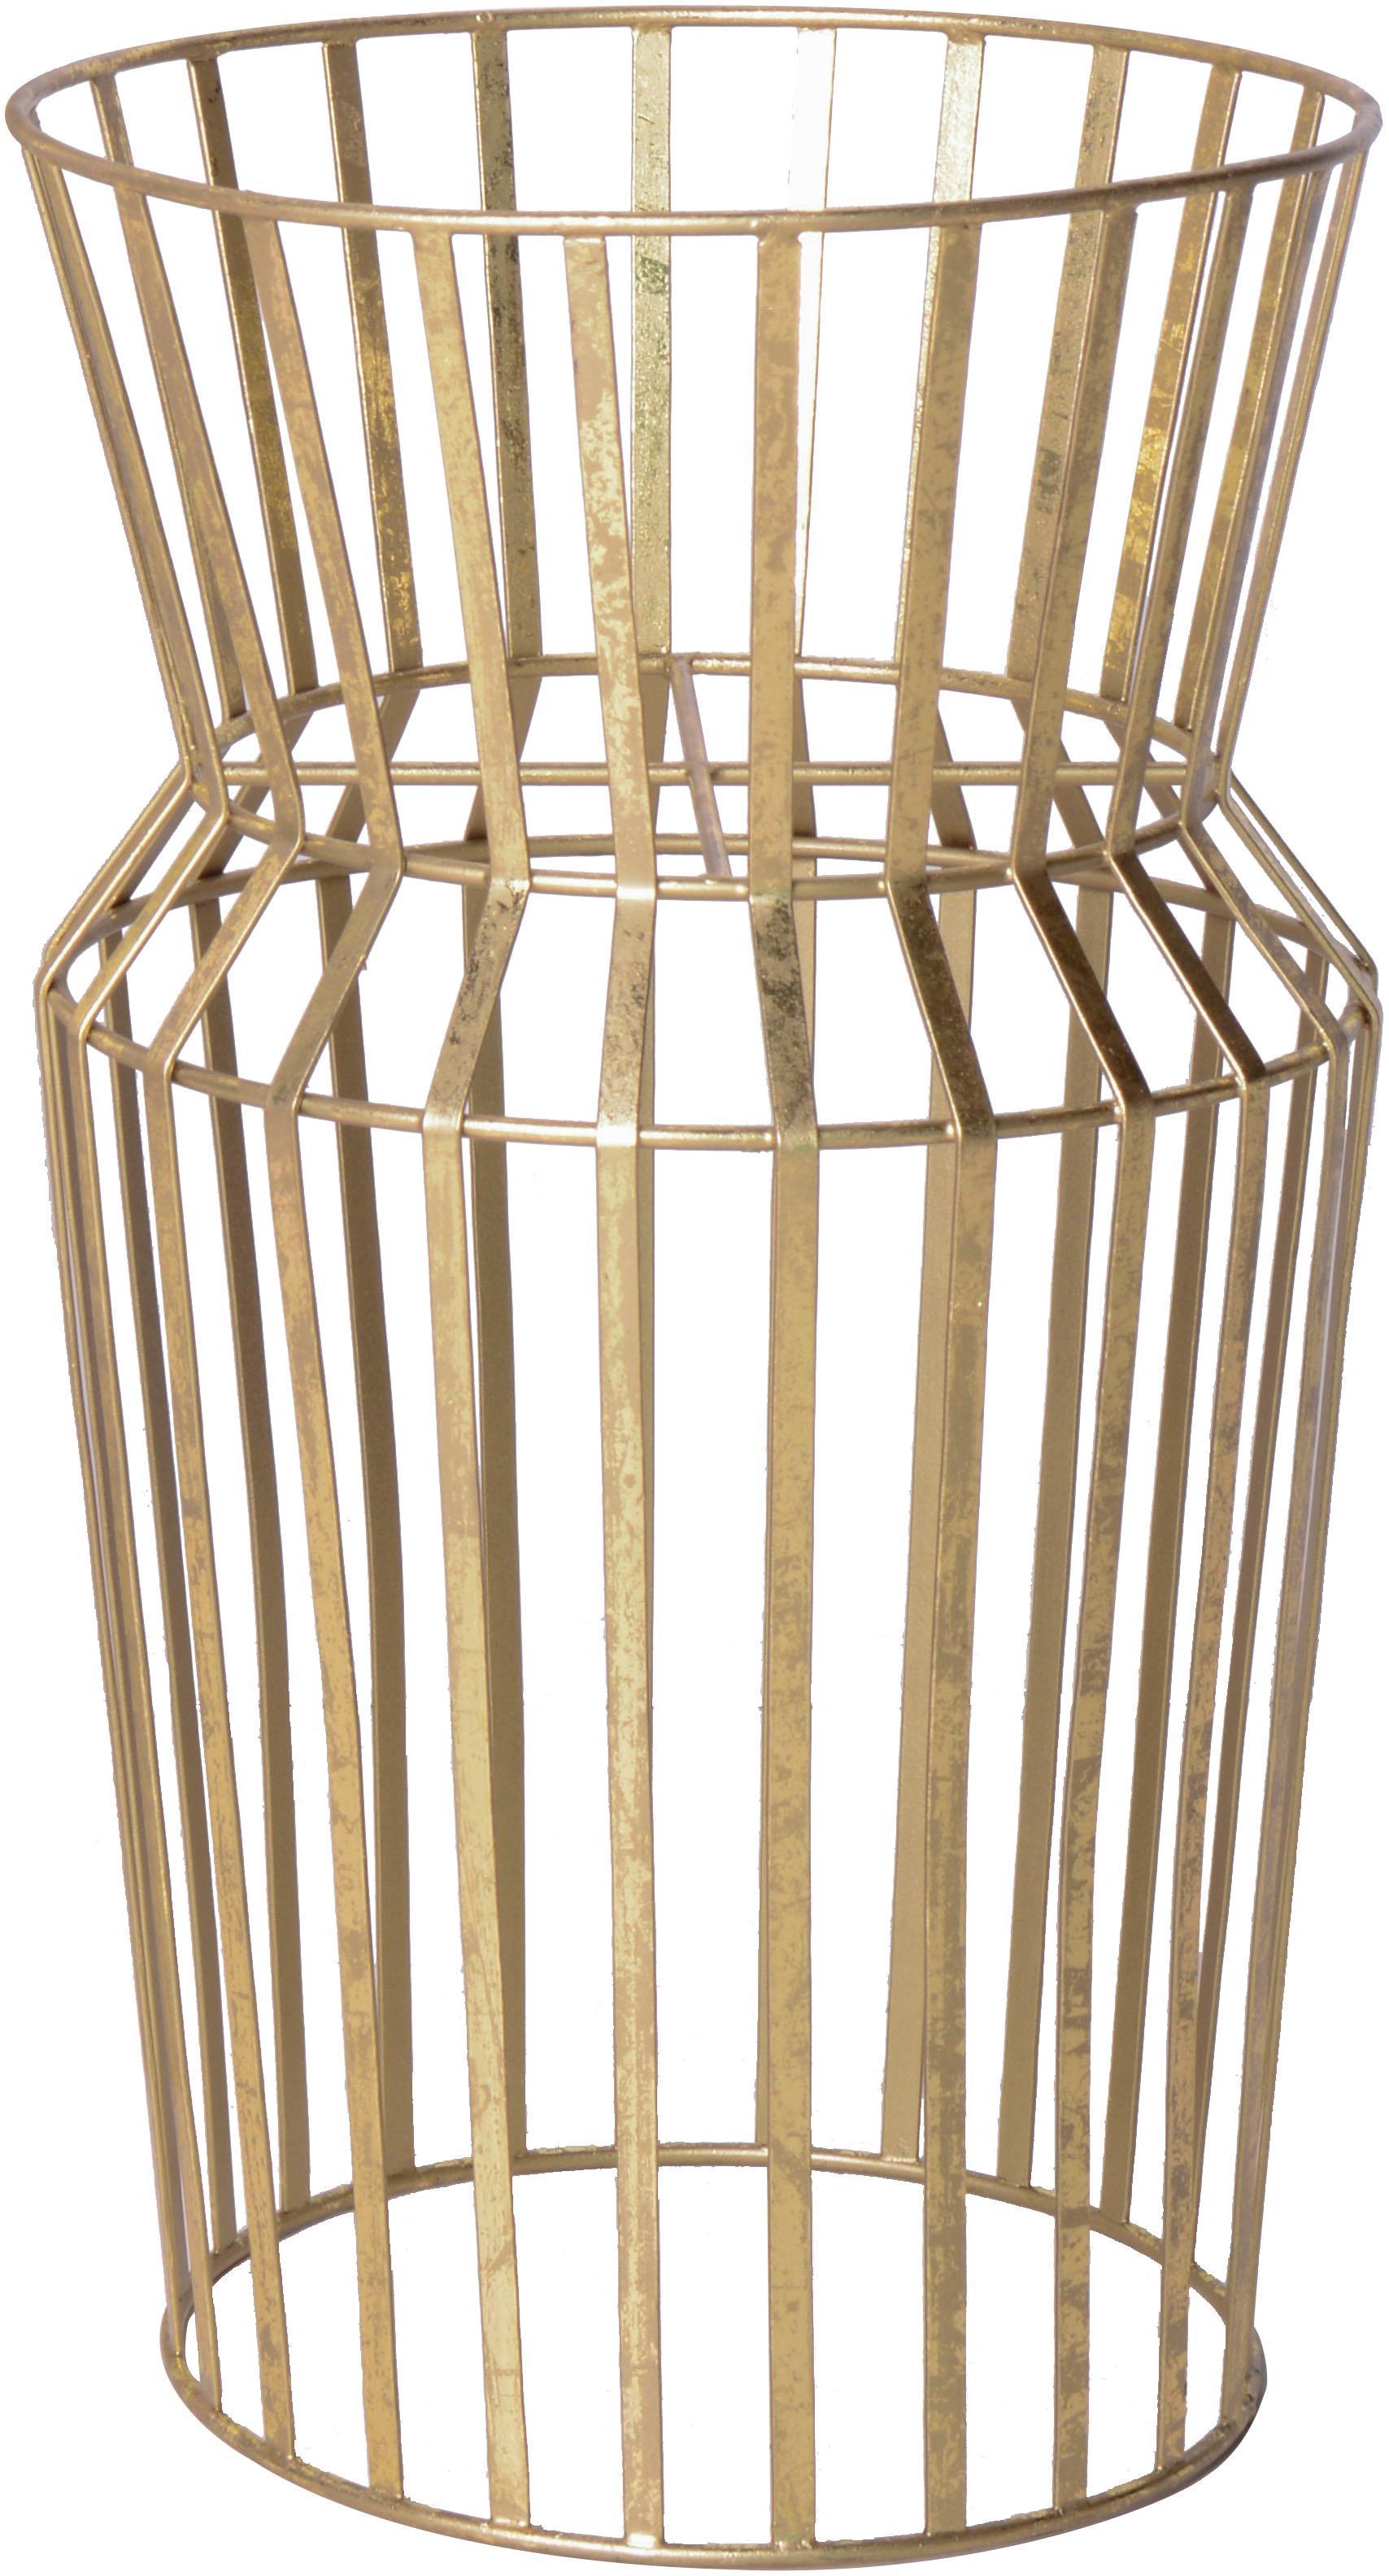 Maceta de pie Gold, Metal, recubierto, Latón, Ø 28 x Al 50 cm